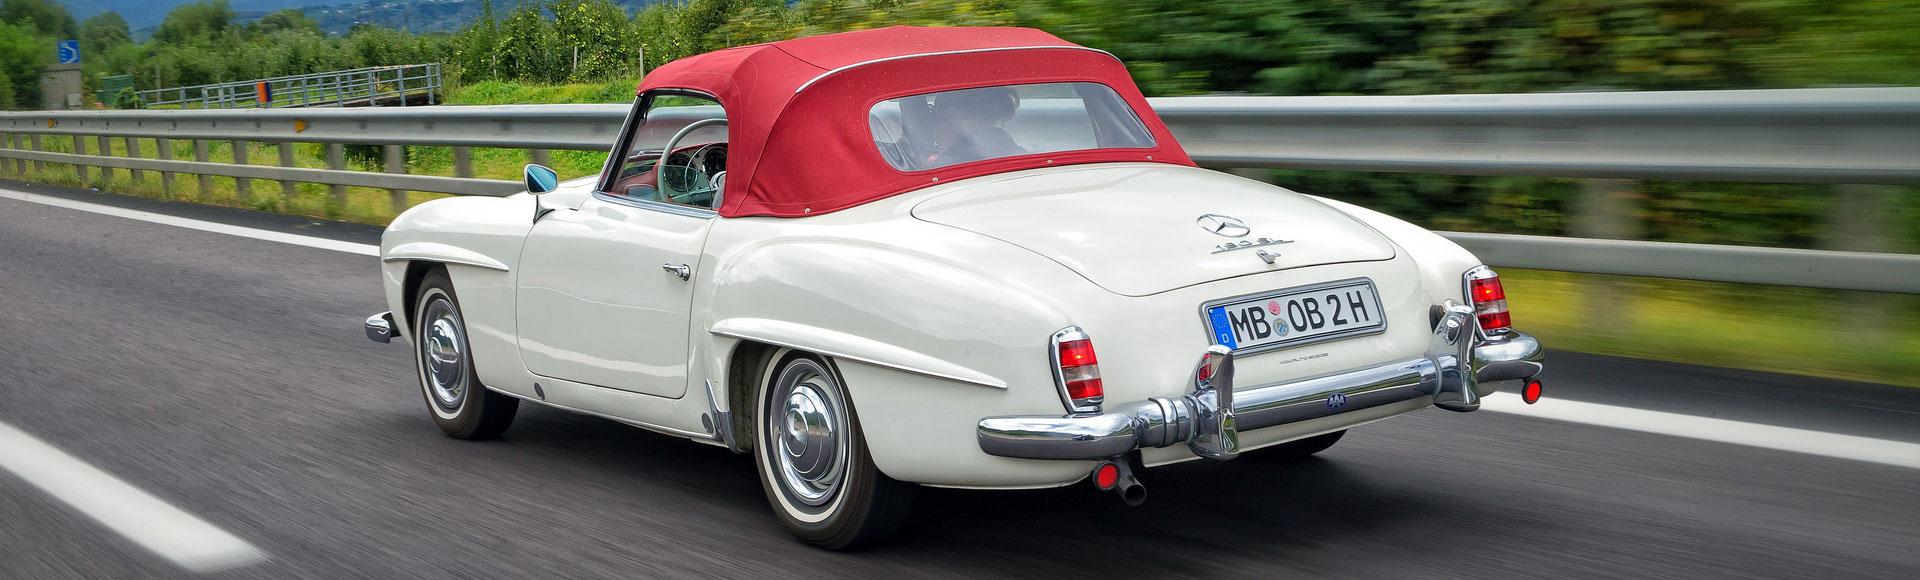 Mercedes Benz 190 SL 1959 1331 Sommer